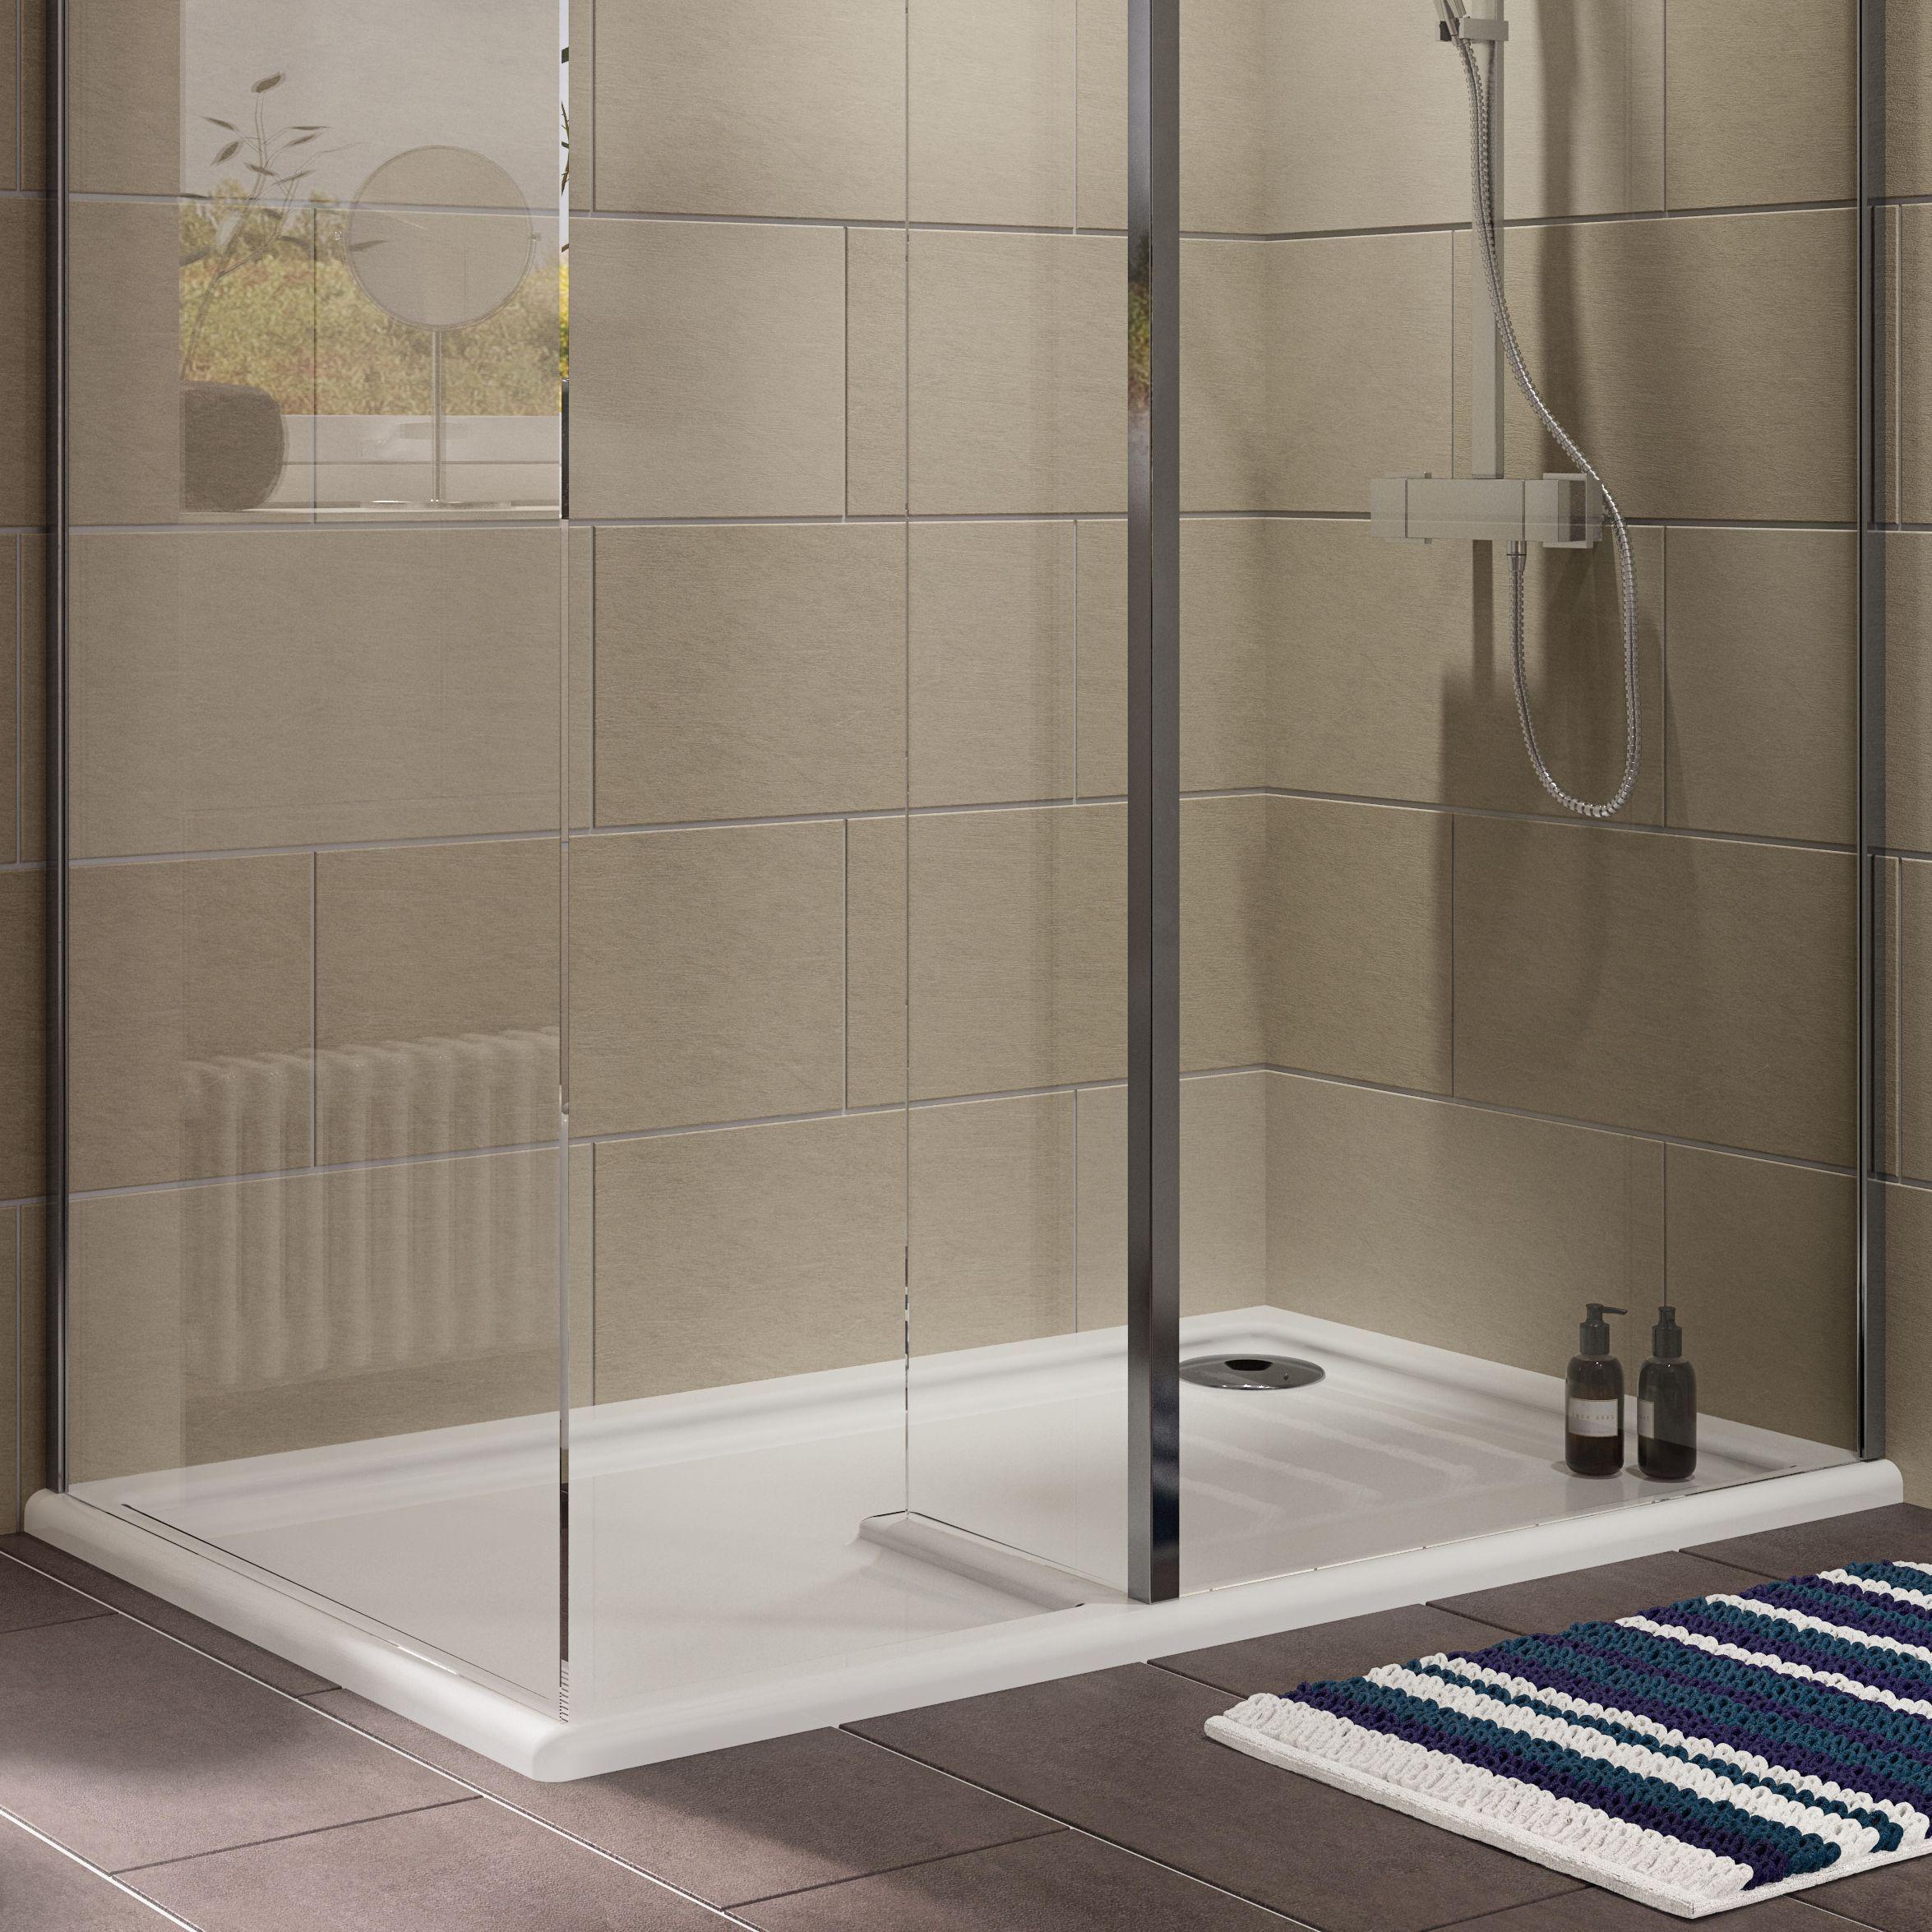 Cooke Lewis Ultra Low Profile Lh Rectangular Walk In Shower